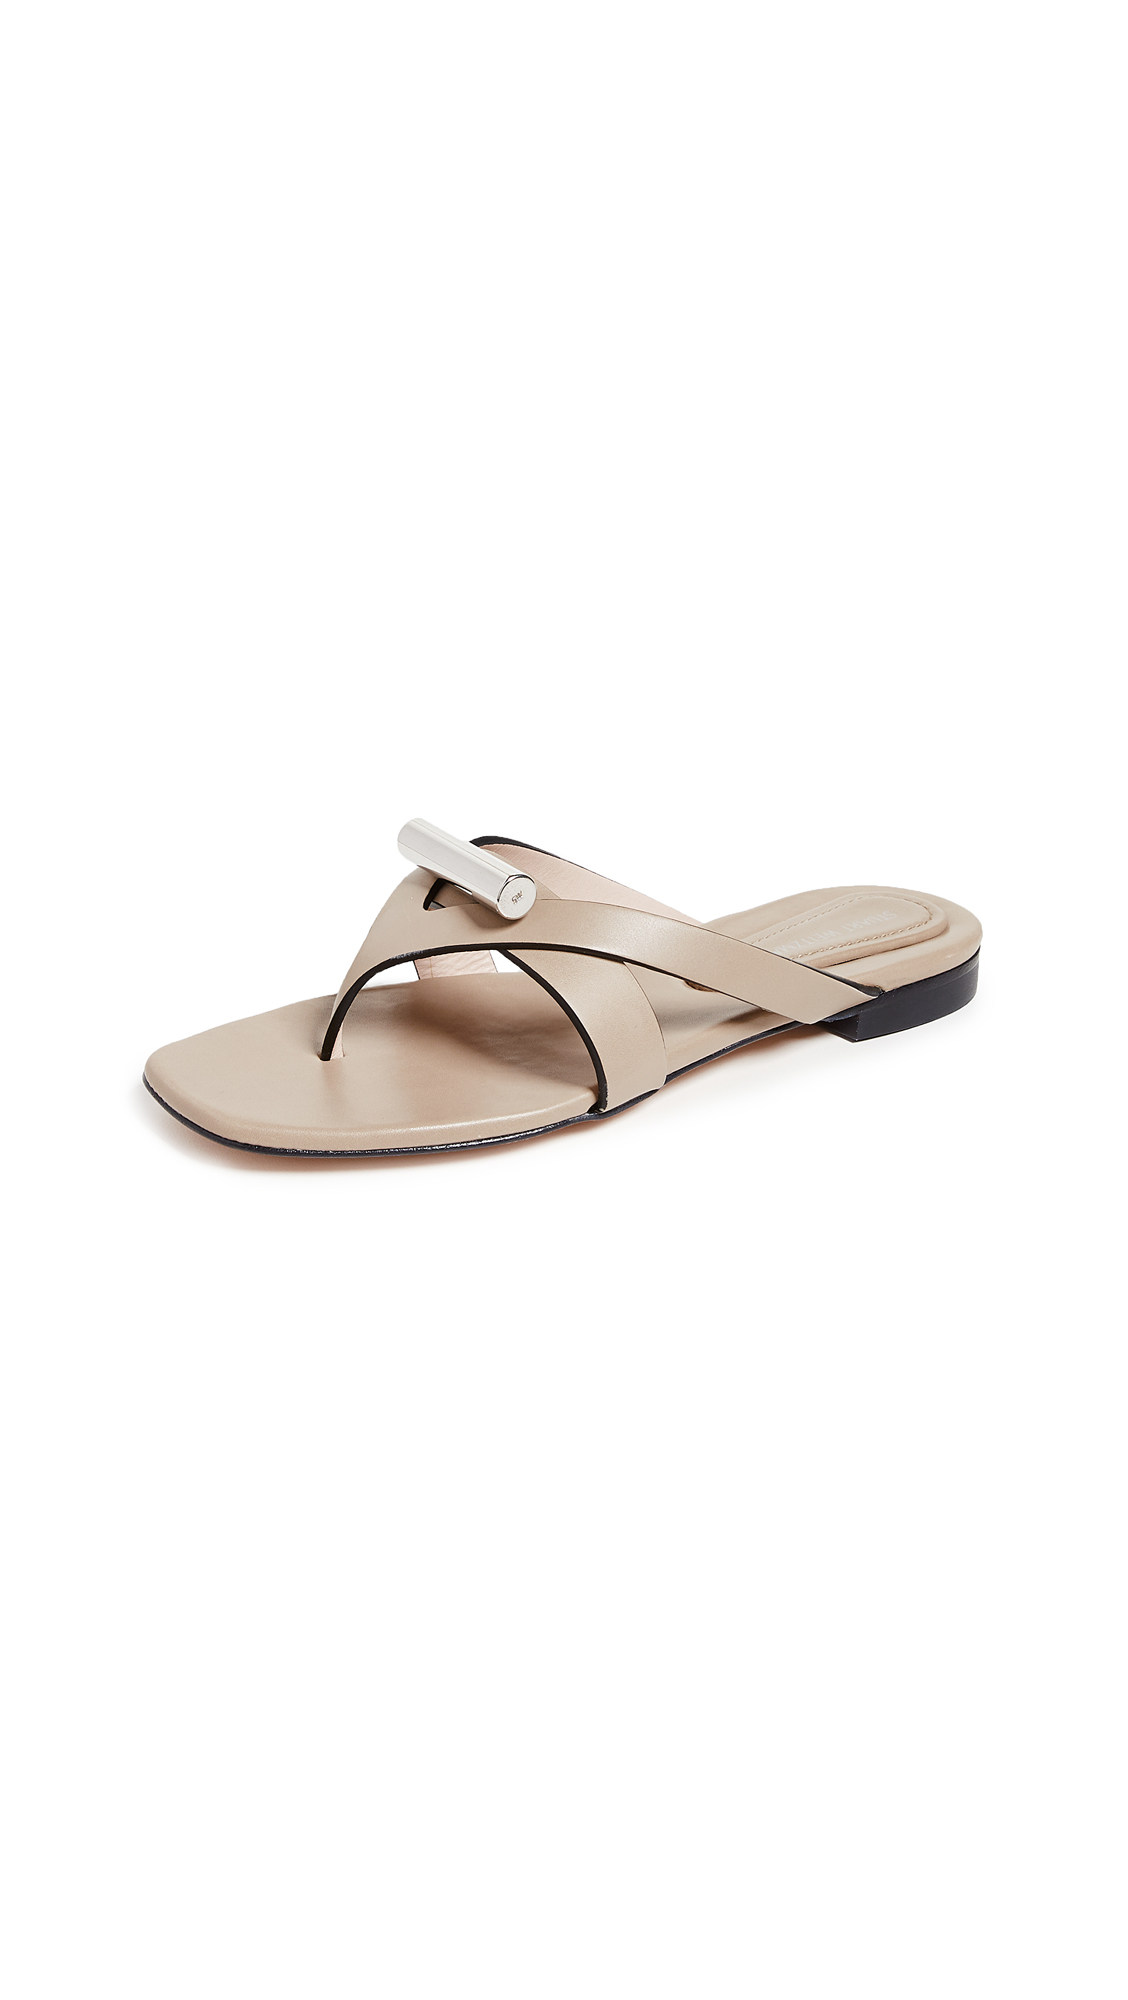 Stuart Weitzman Arro Thong Sandals